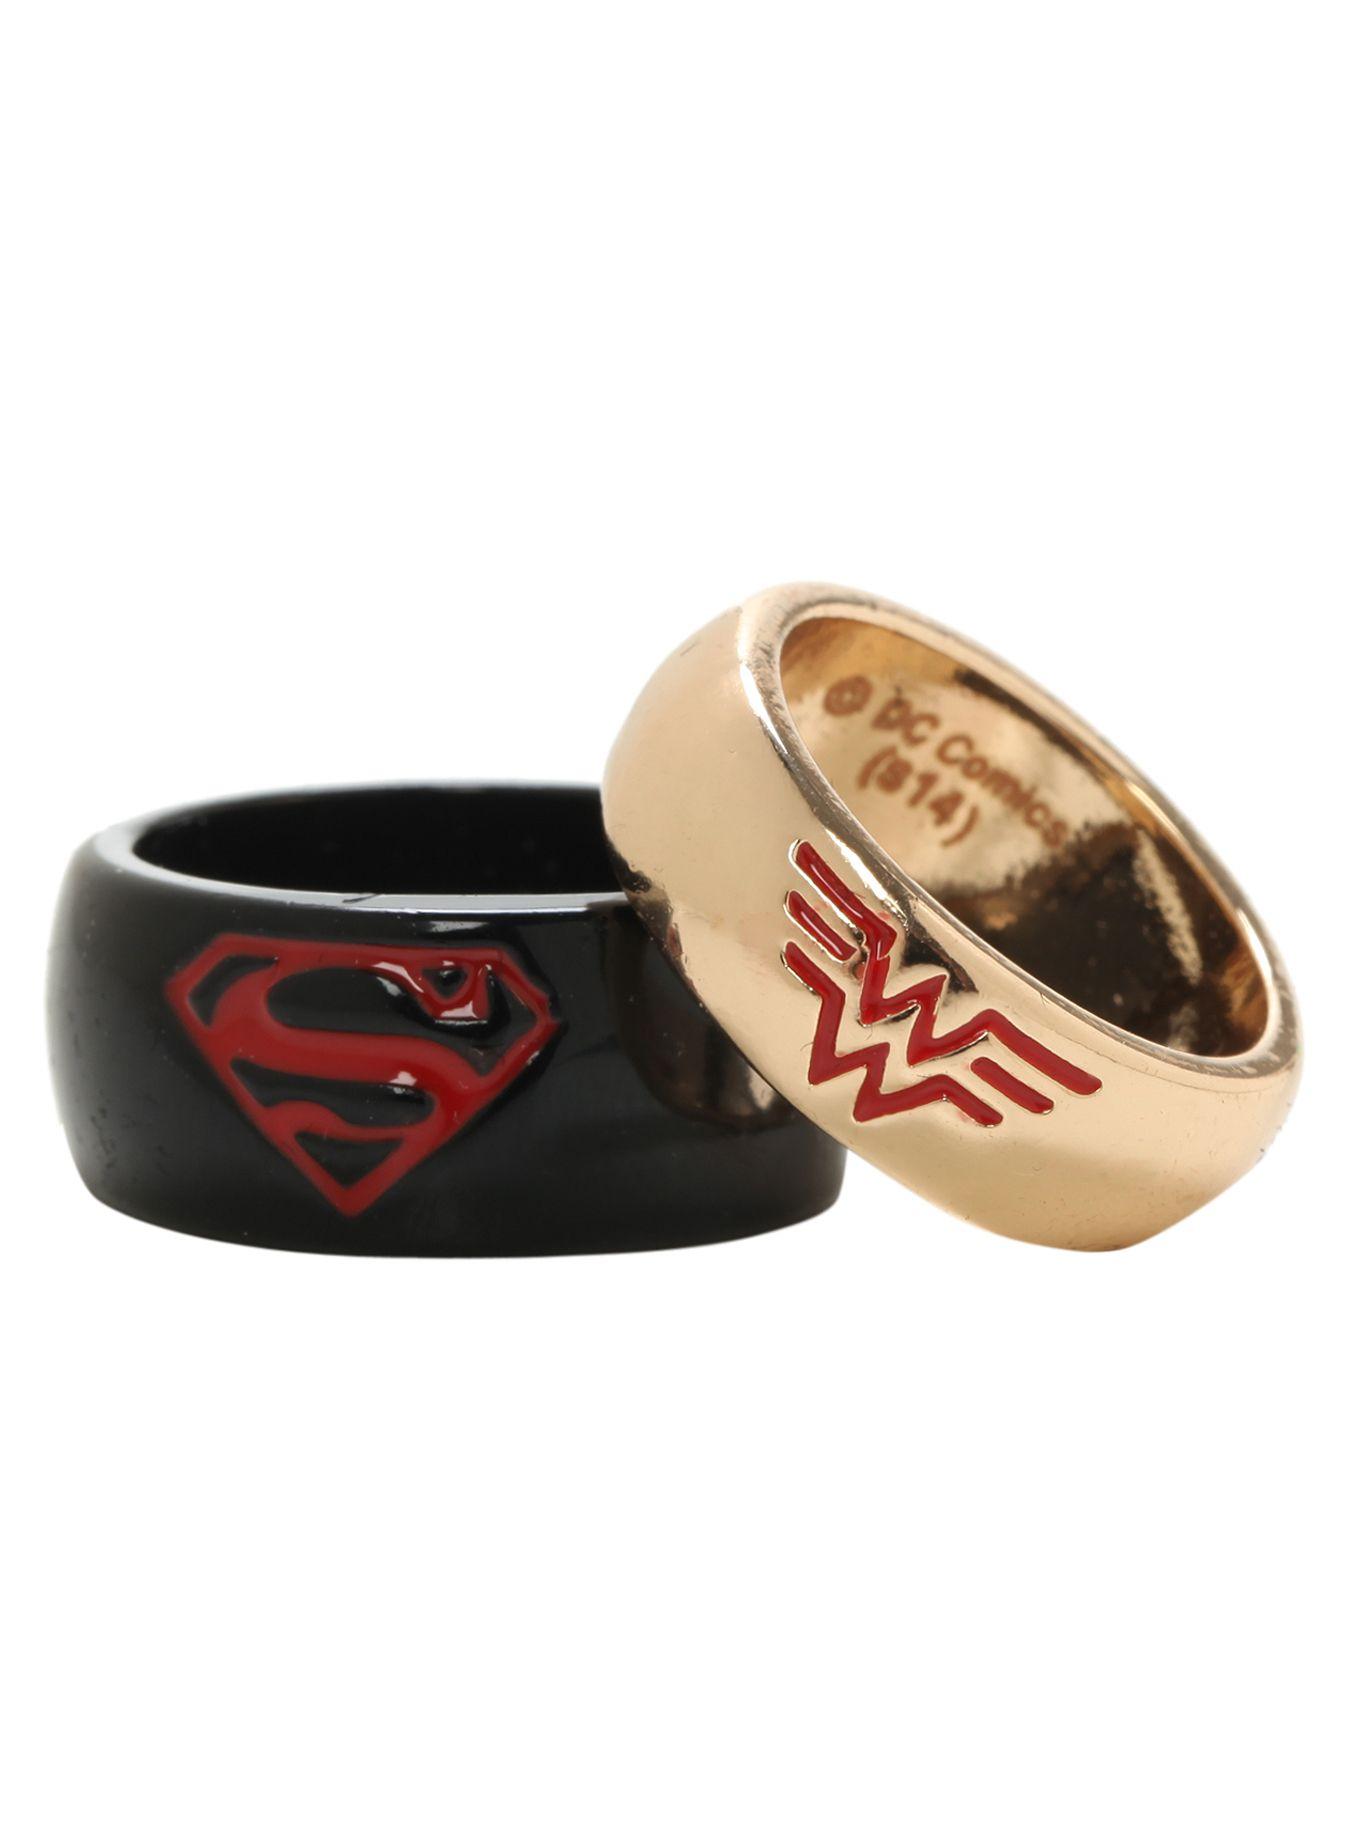 Dc Comics Superman Wonder Woman His Hers Medium Ring Set Hot Topic